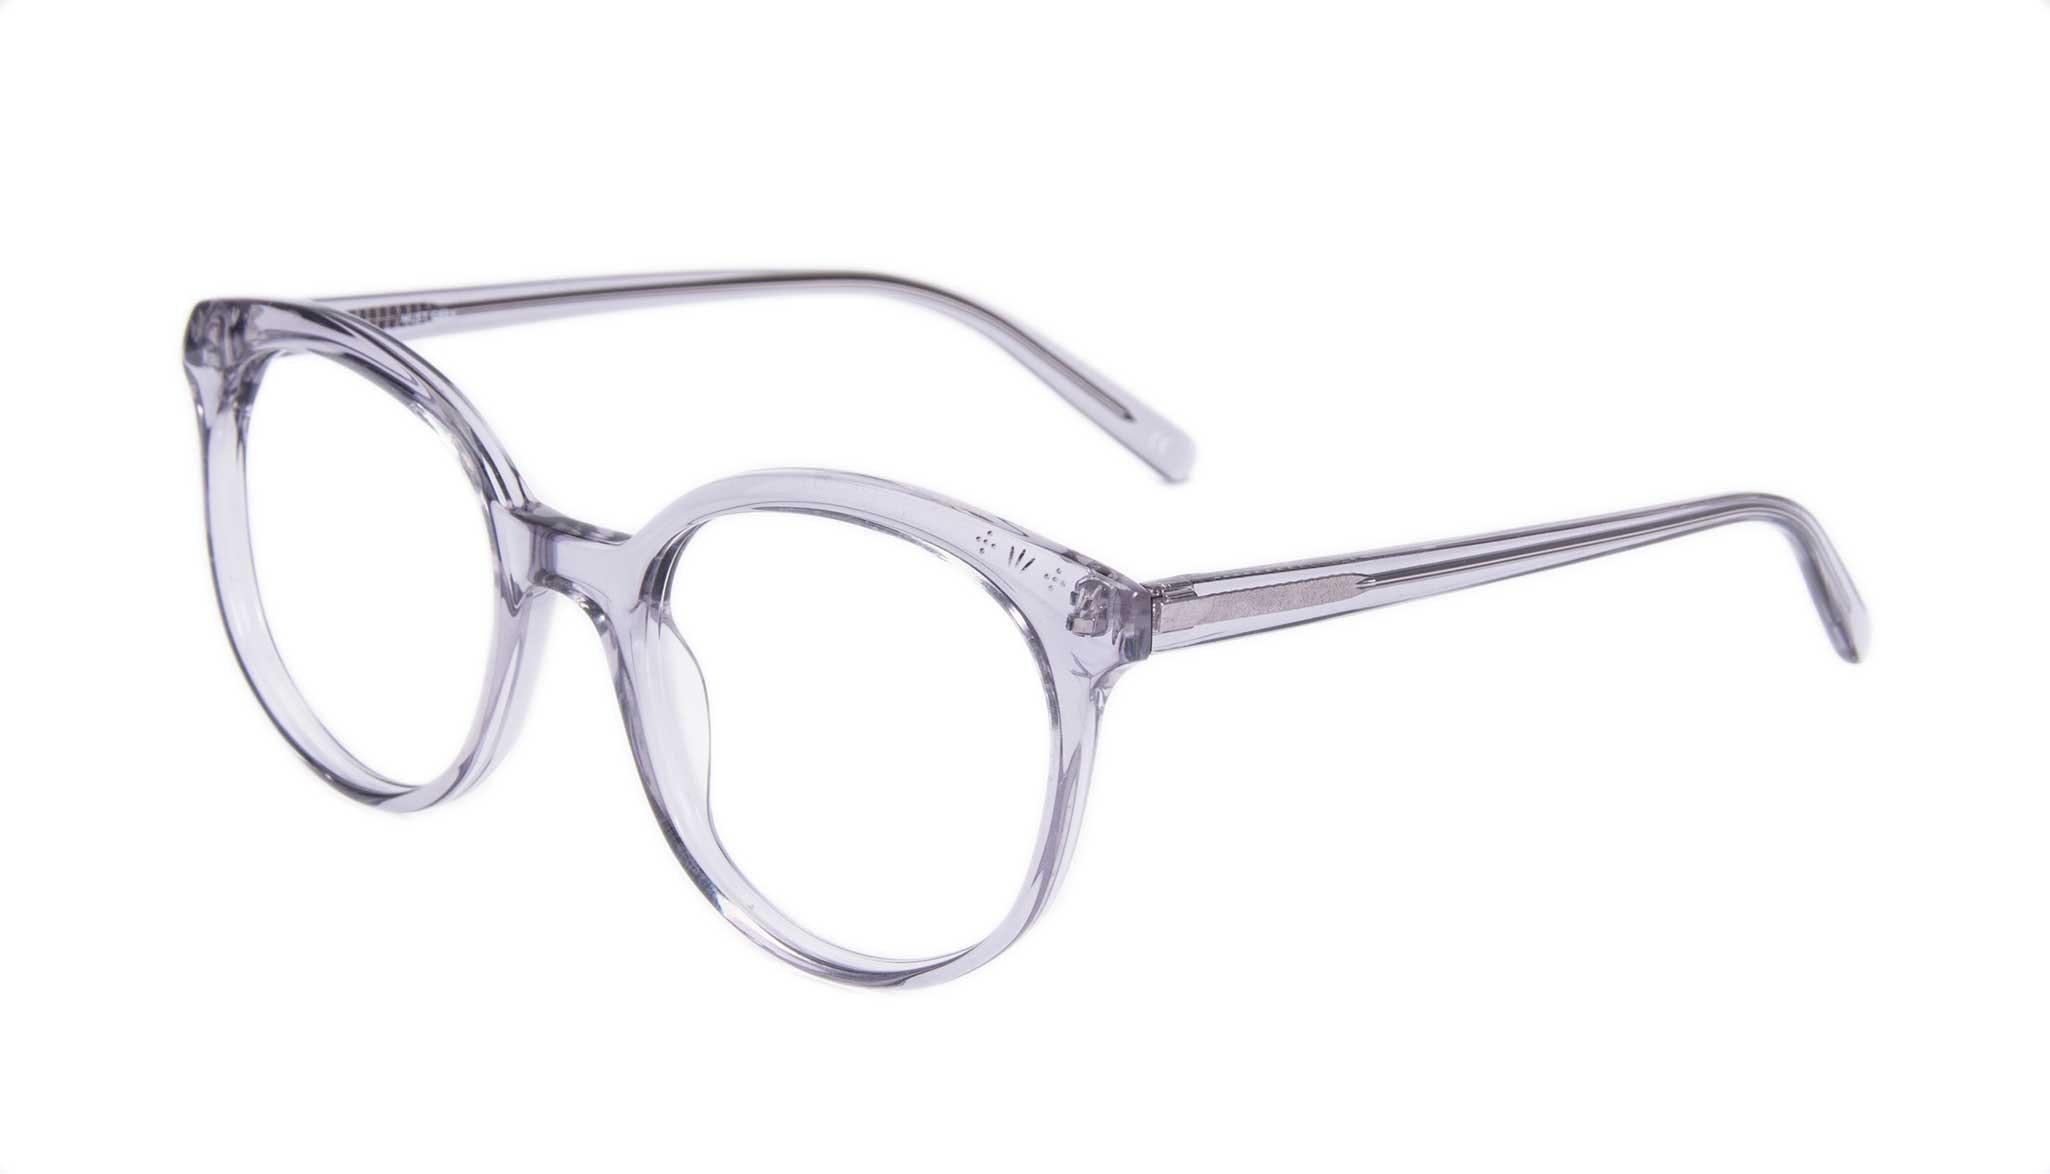 Affordable Fashion Glasses Round Eyeglasses Women Must Grey Tilt